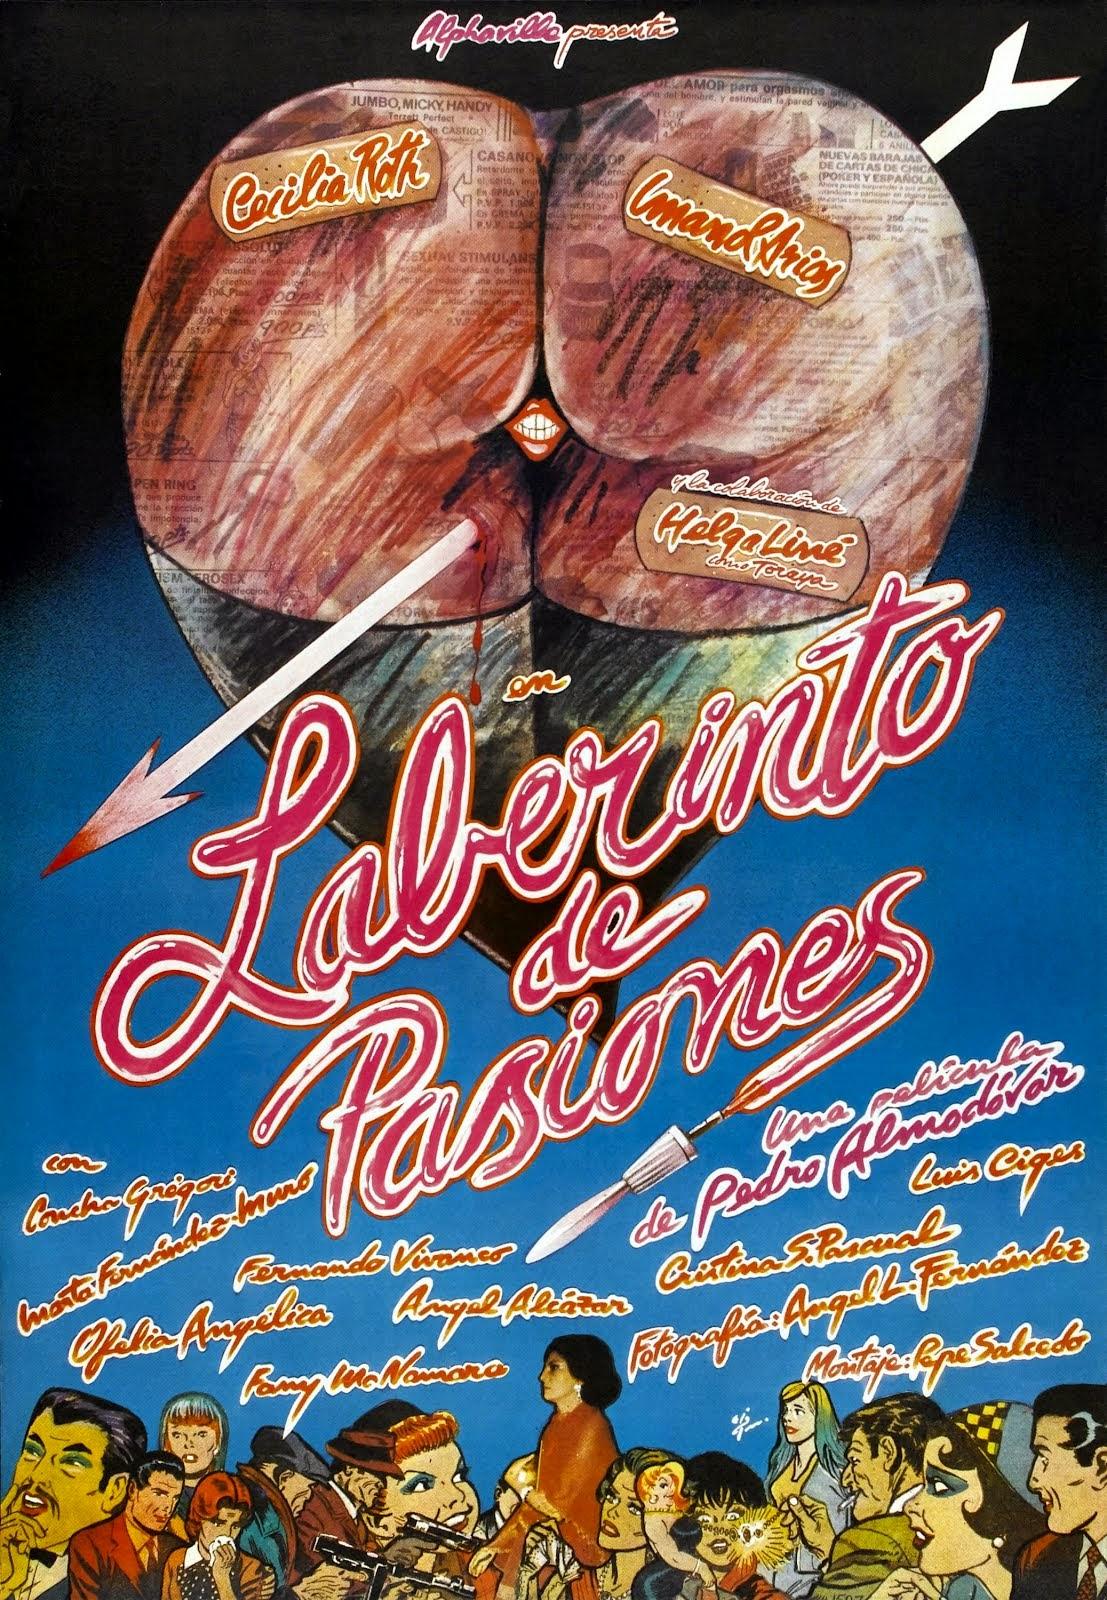 Laberinto de pasiones (27/07/2014)